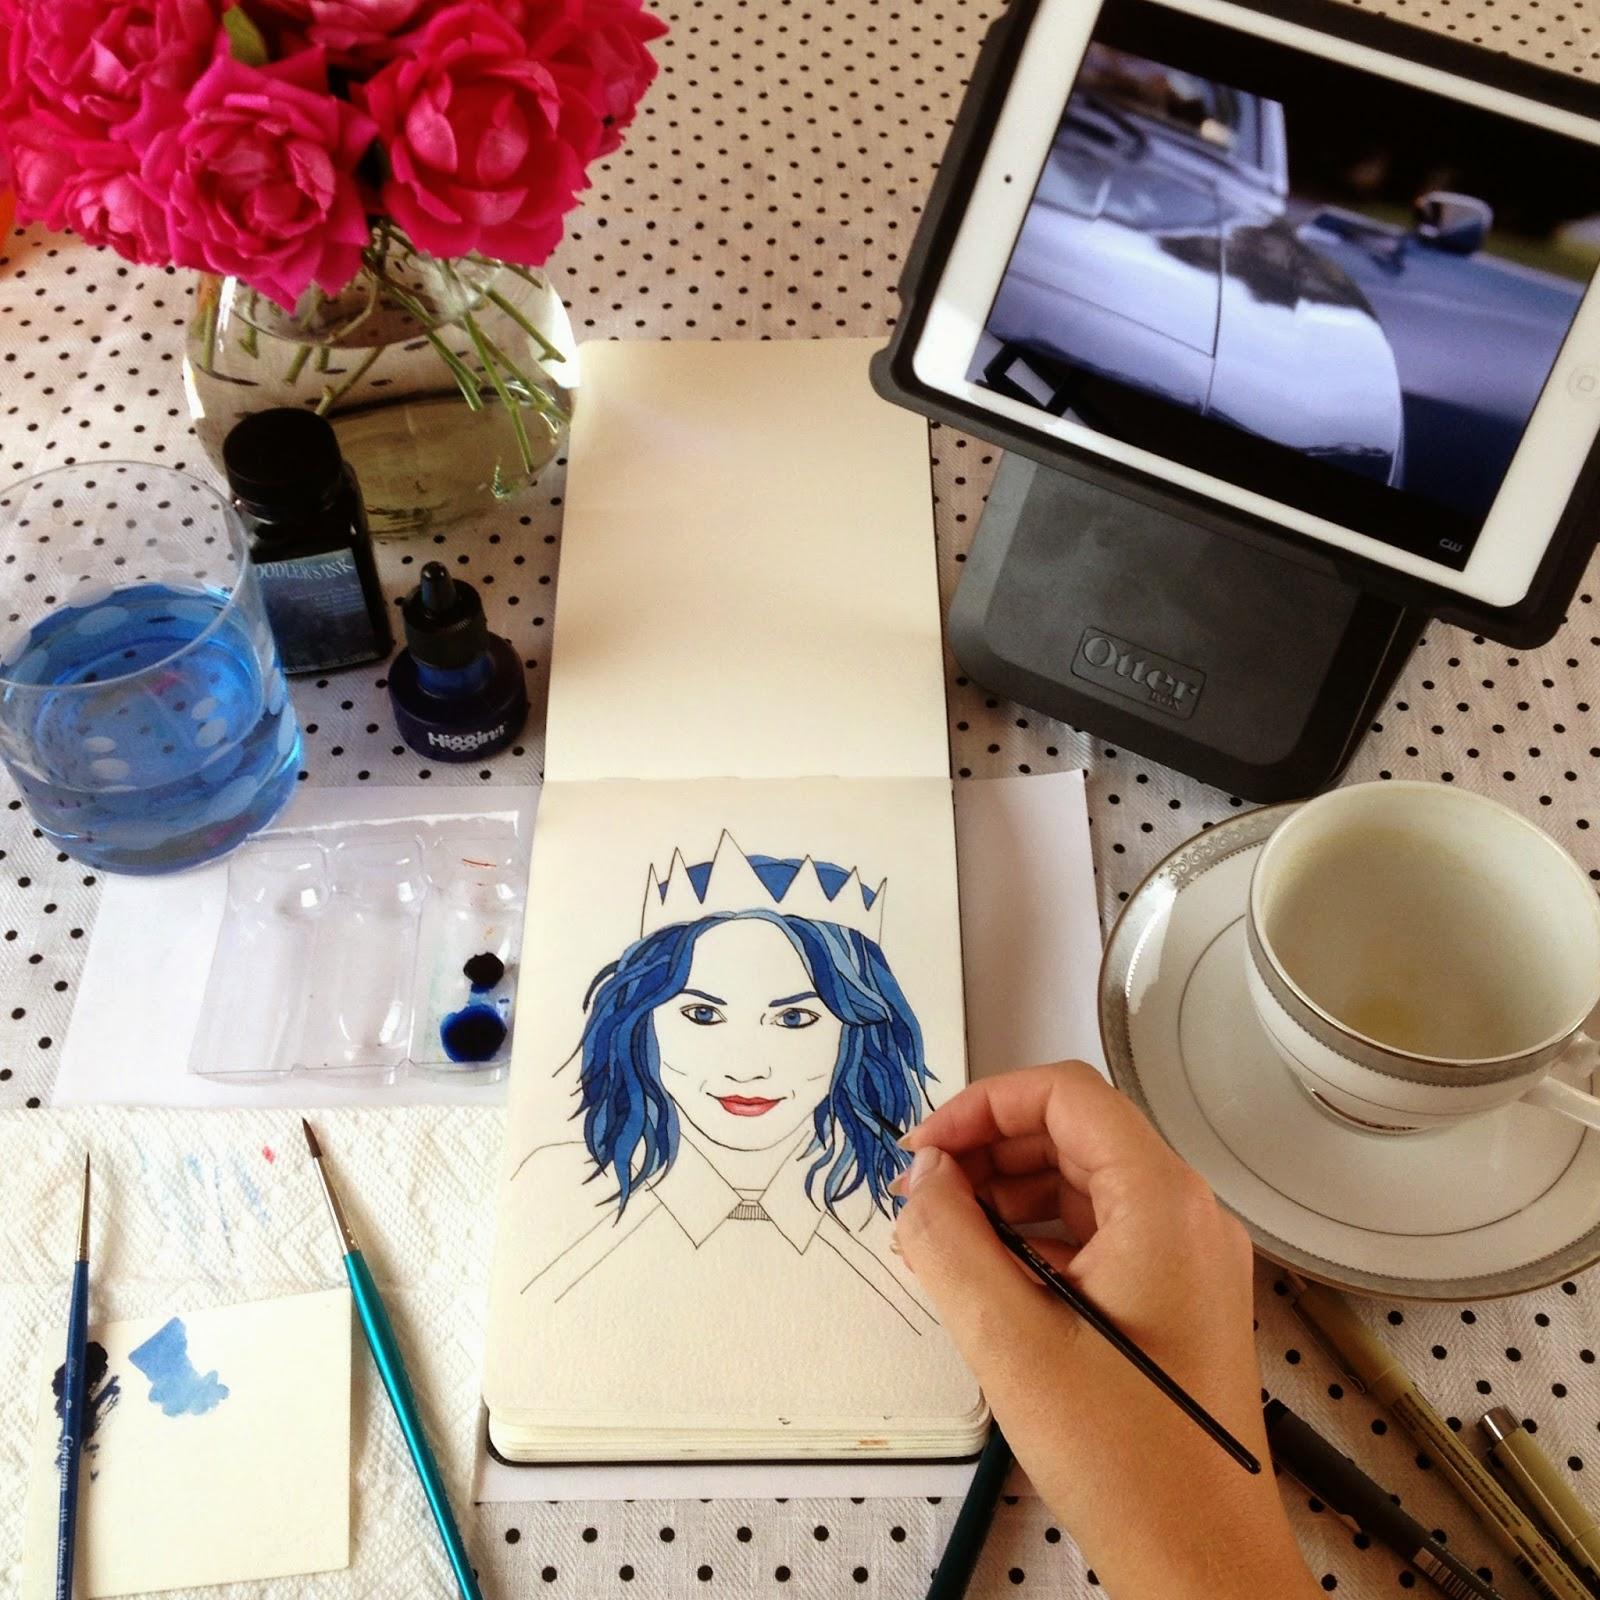 Inktober fashion illustration of Kelly Framel by Jessica Mack aka BrownPaperBunny